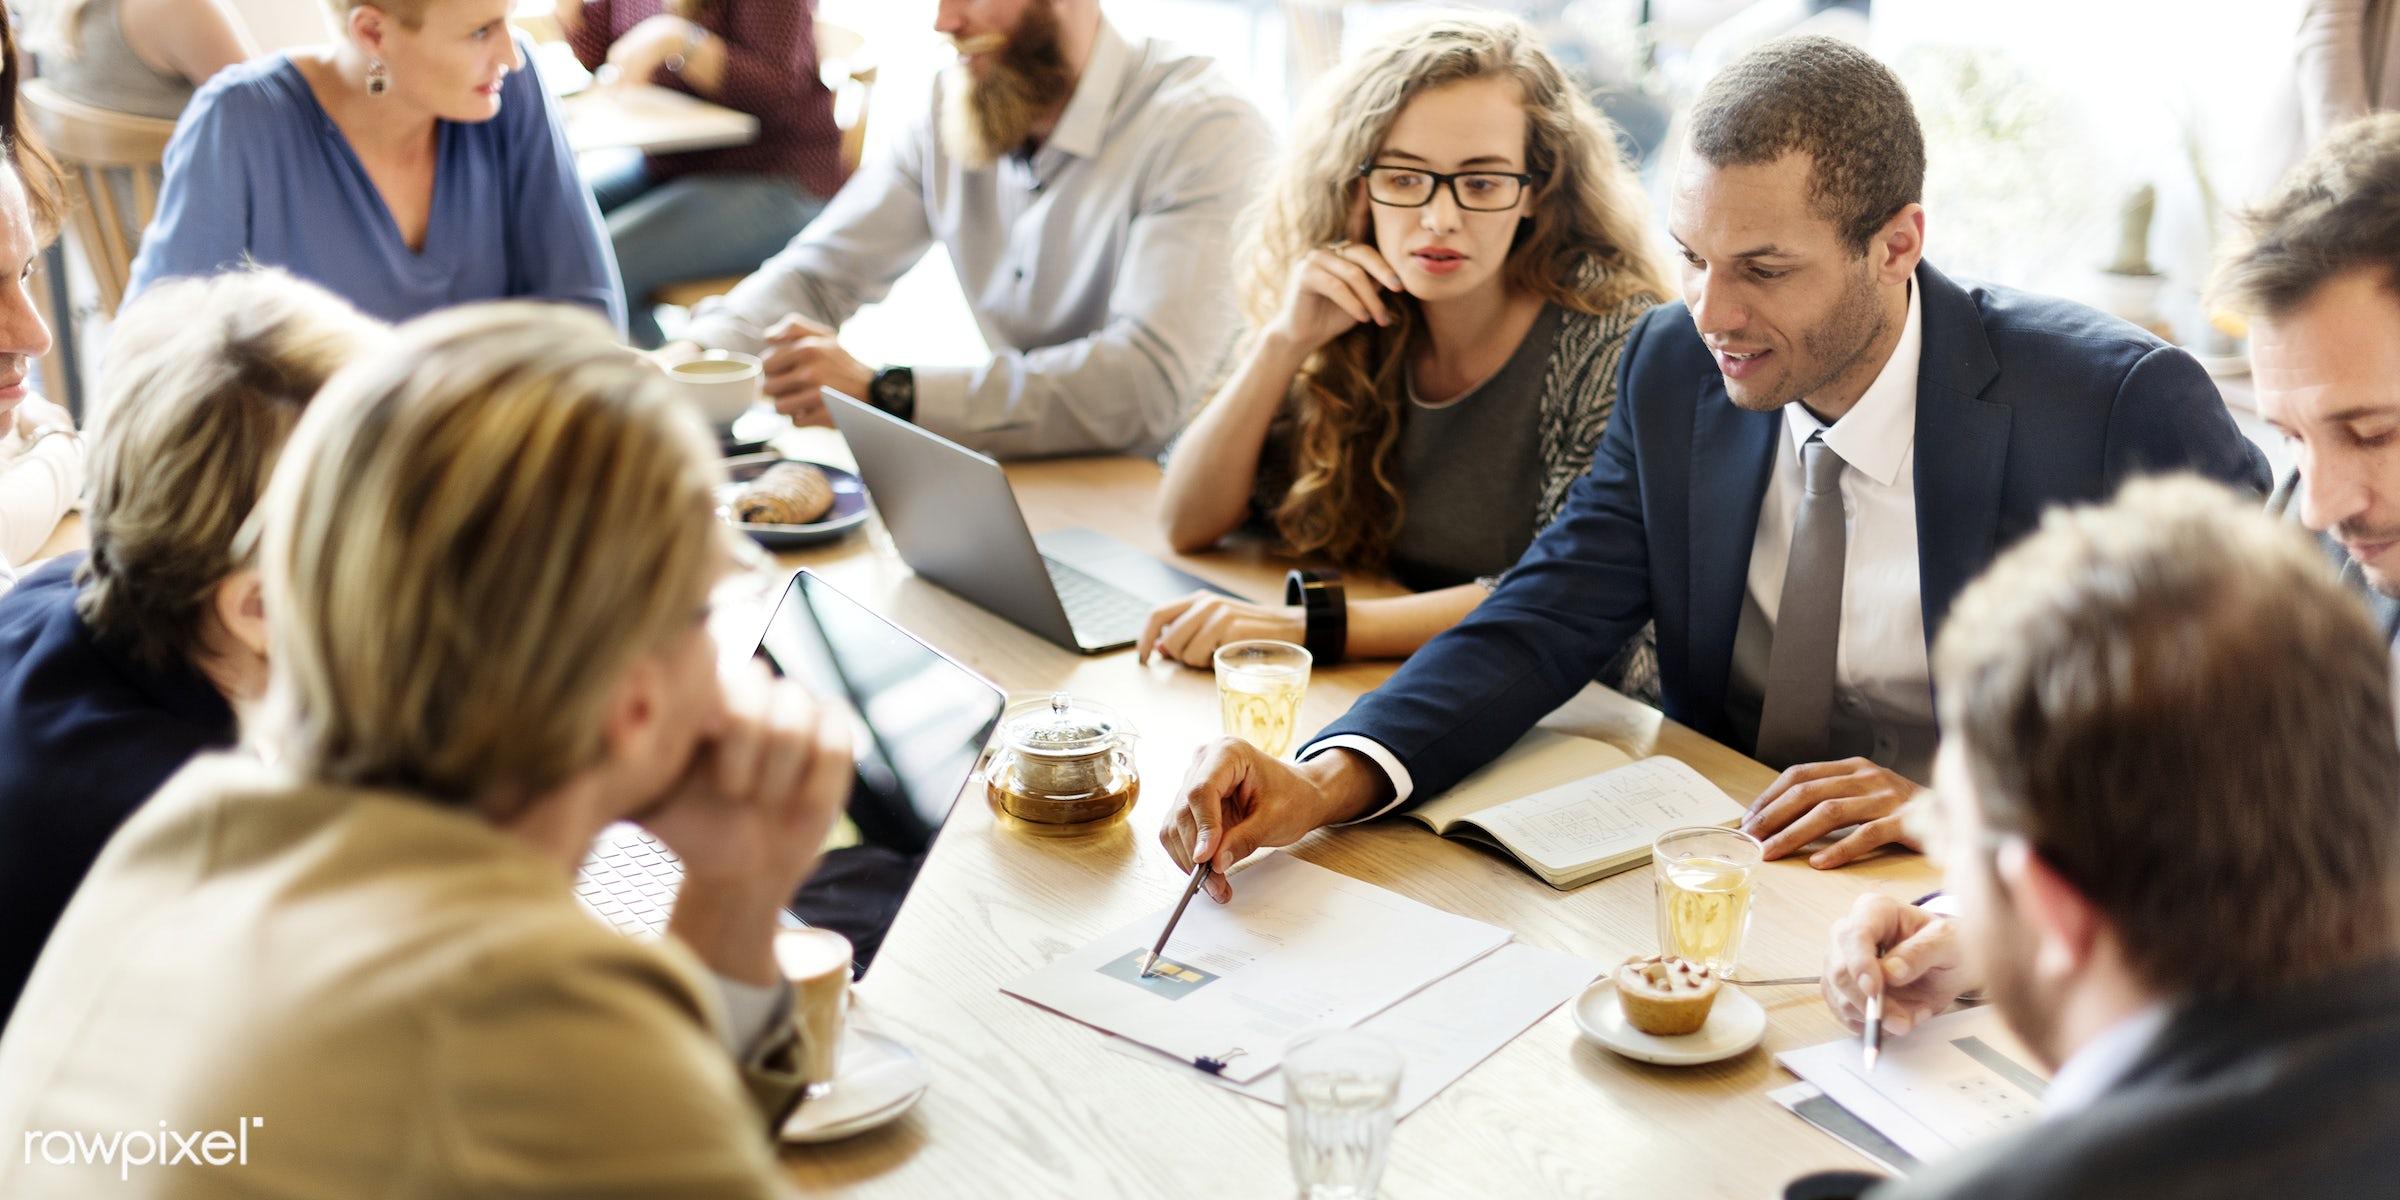 analysing, analyze, analyzing, brainstorming, business, business plan, businessmen, businesswomen, cafe, coffee shop,...